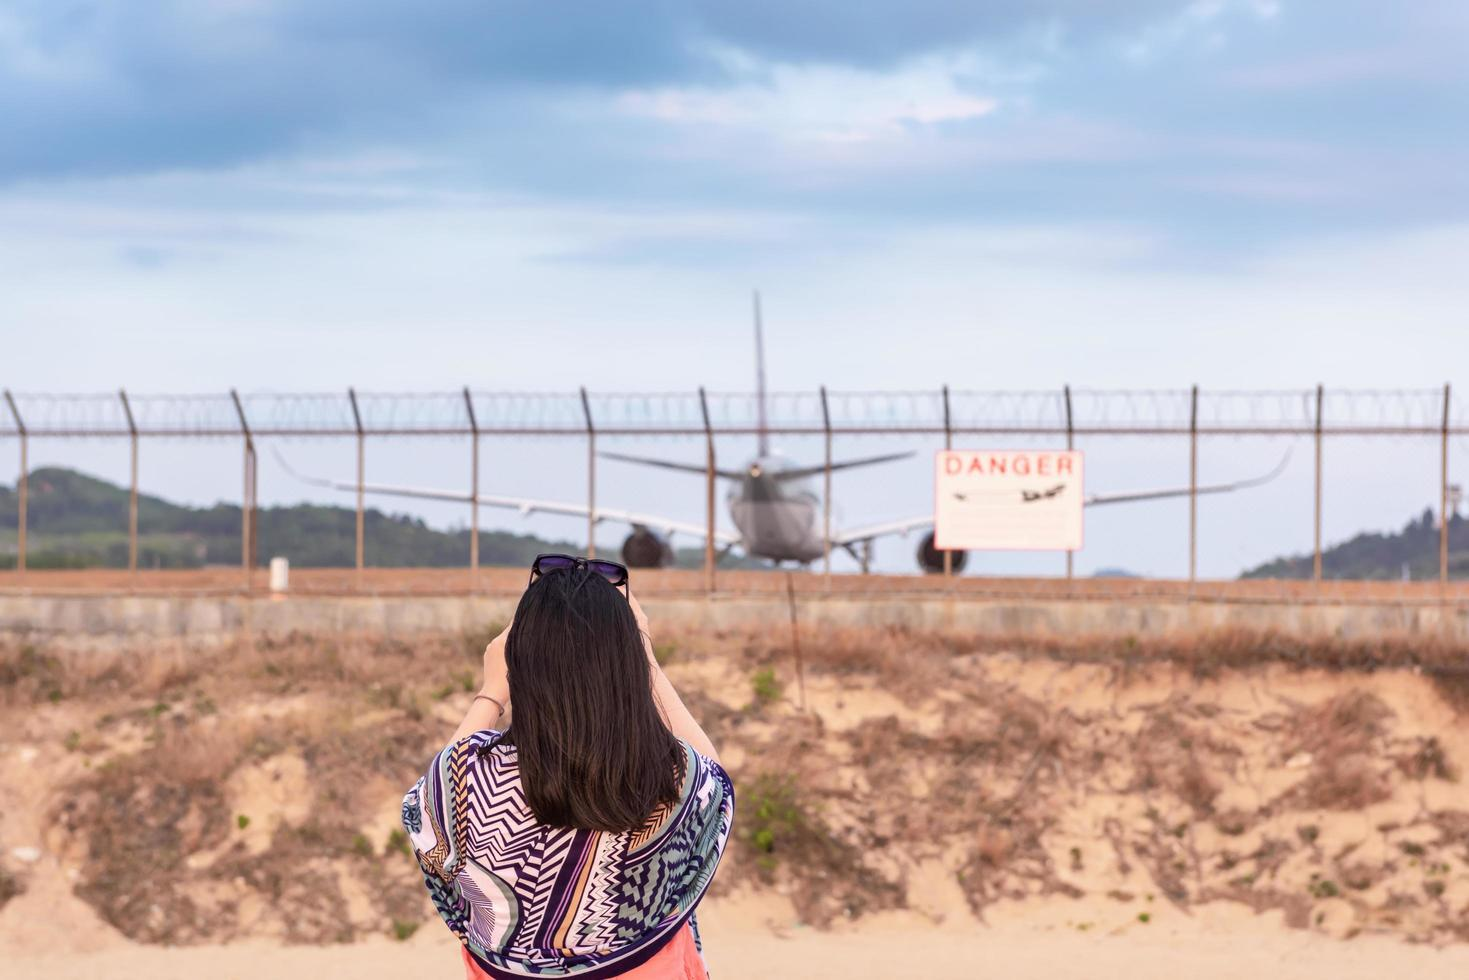 mujer fotografiando avión foto